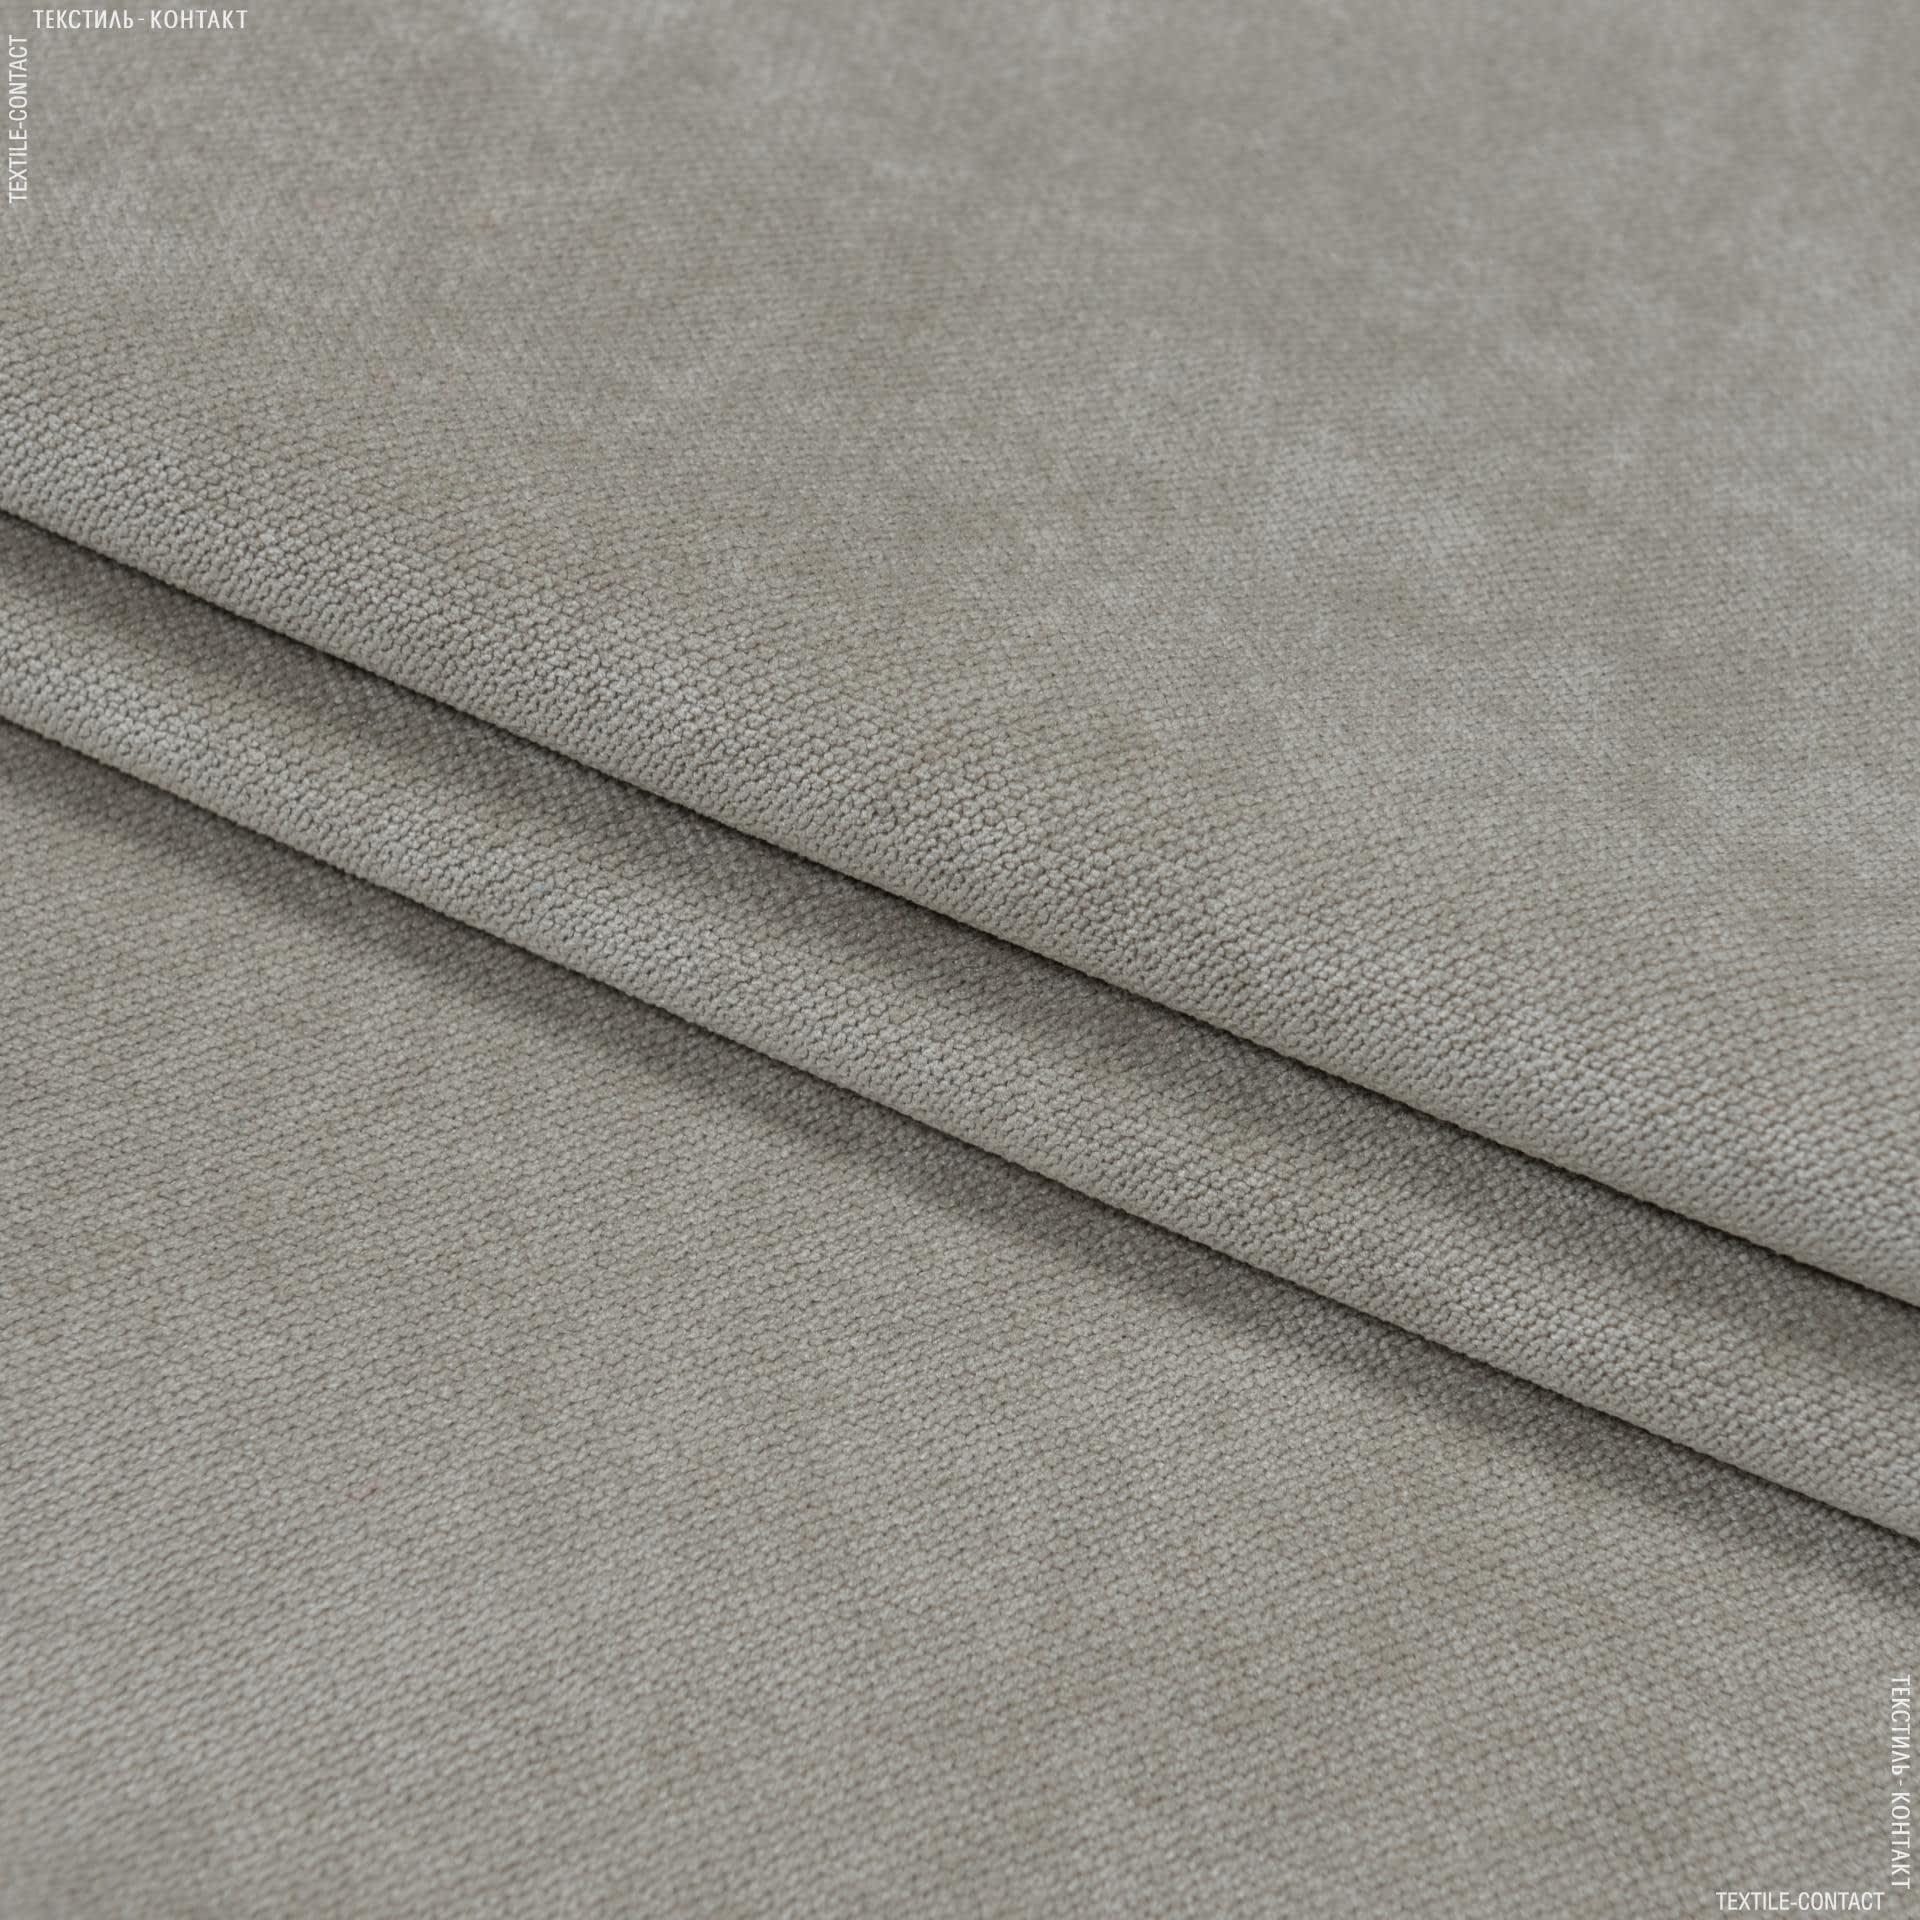 Ткани для мебели - Велюр будапешт/budapest серый-беж